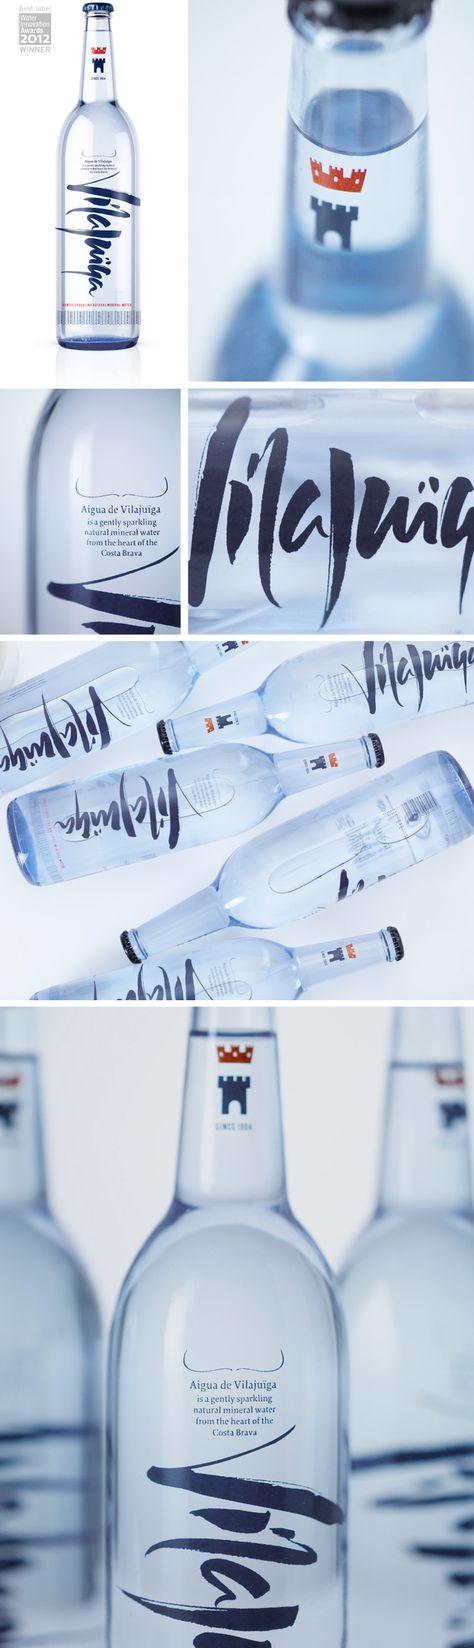 Award-winning rebrand of Aigua de Vilajuïga mineral water by Studio h